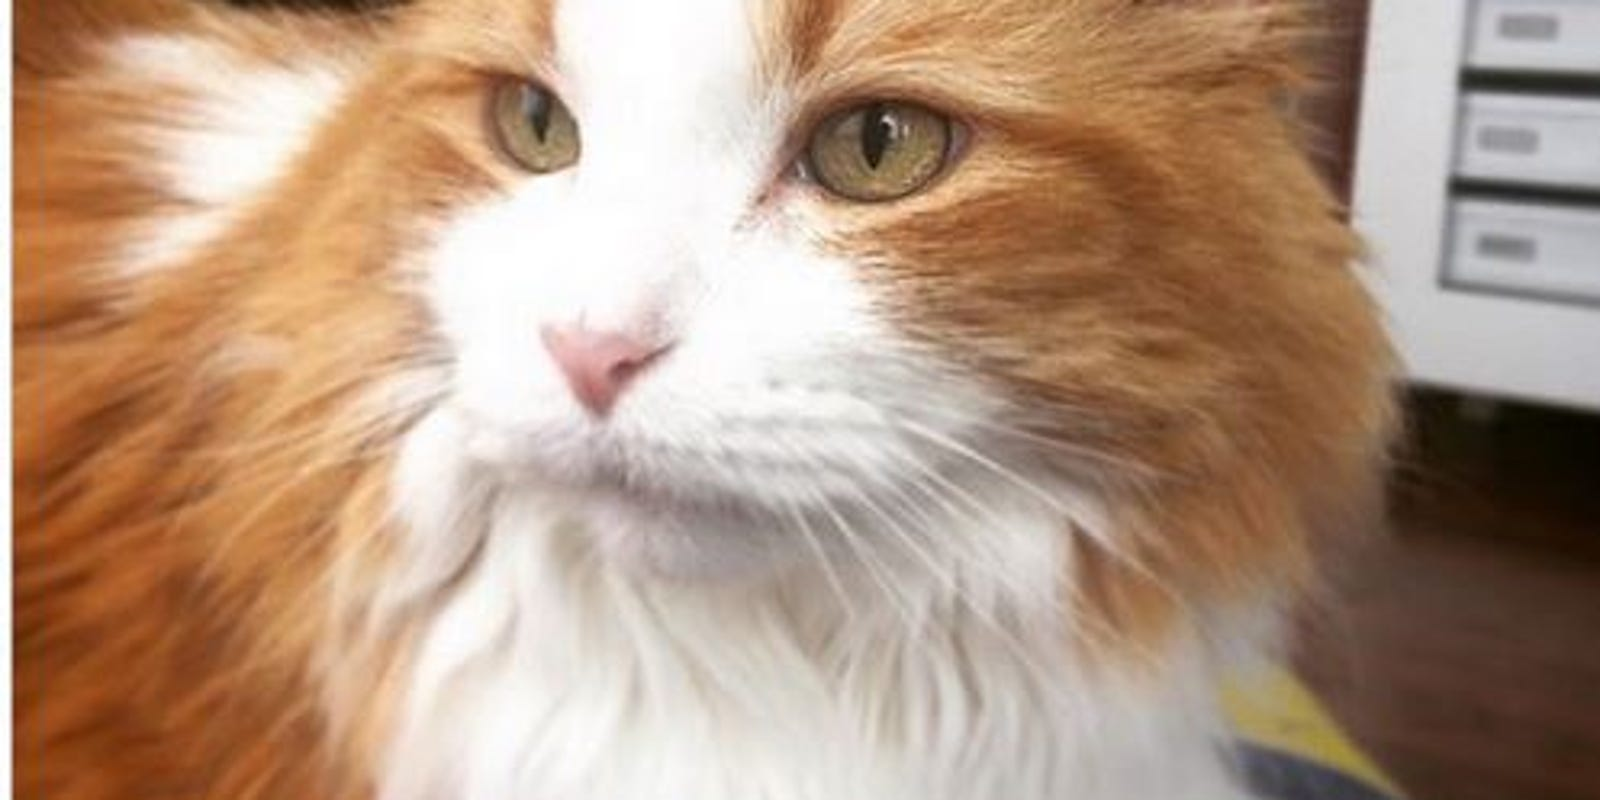 Concorso Design Your Cat : Trumpyourcat design cat s hair to copy donald trump